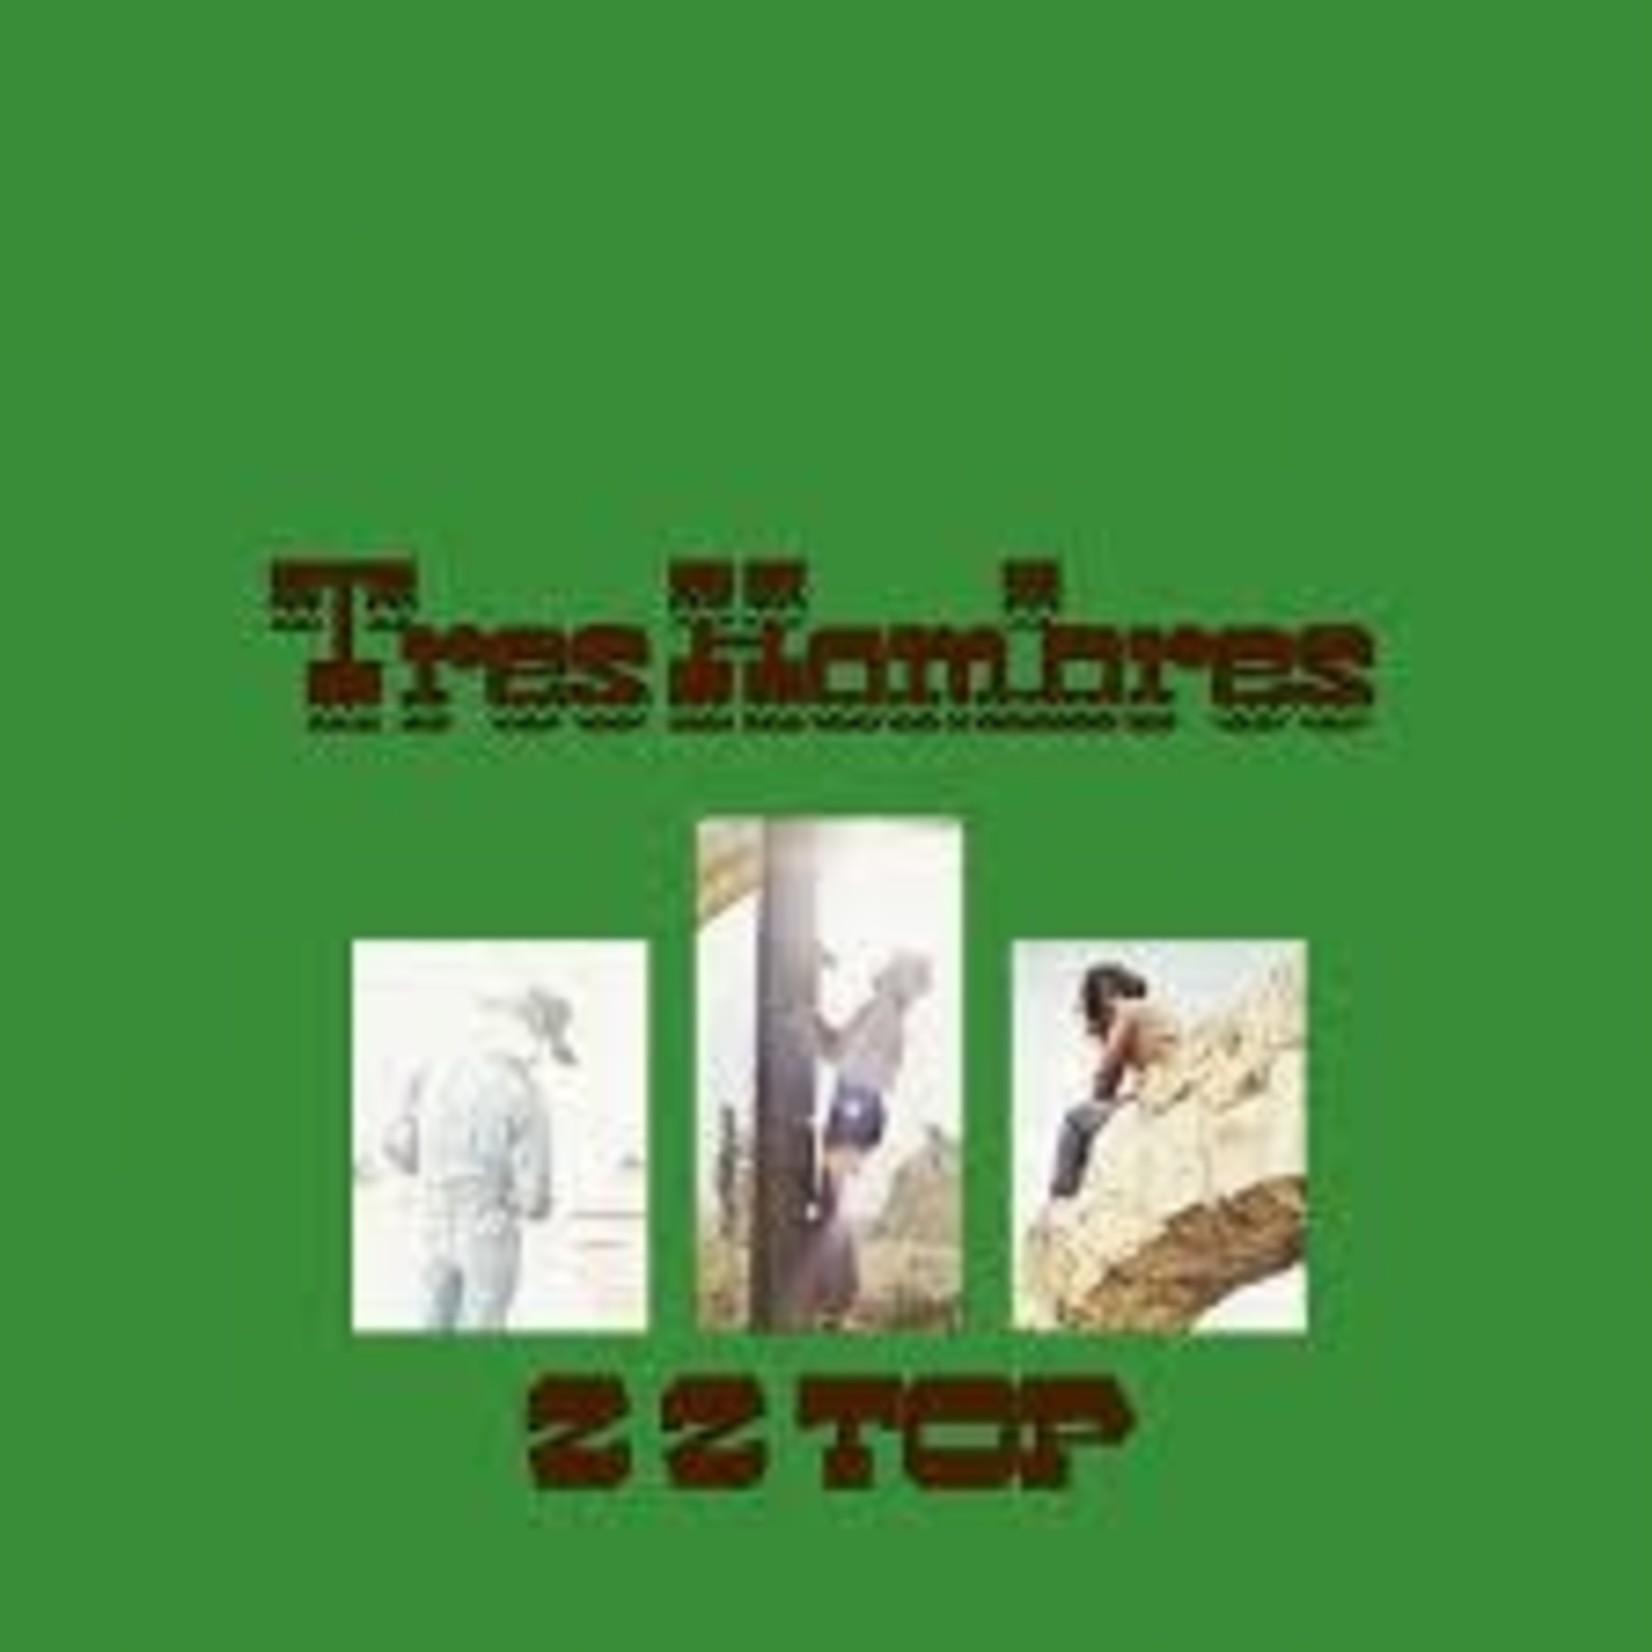 Vinyl ZZ Top - Tres Hombres